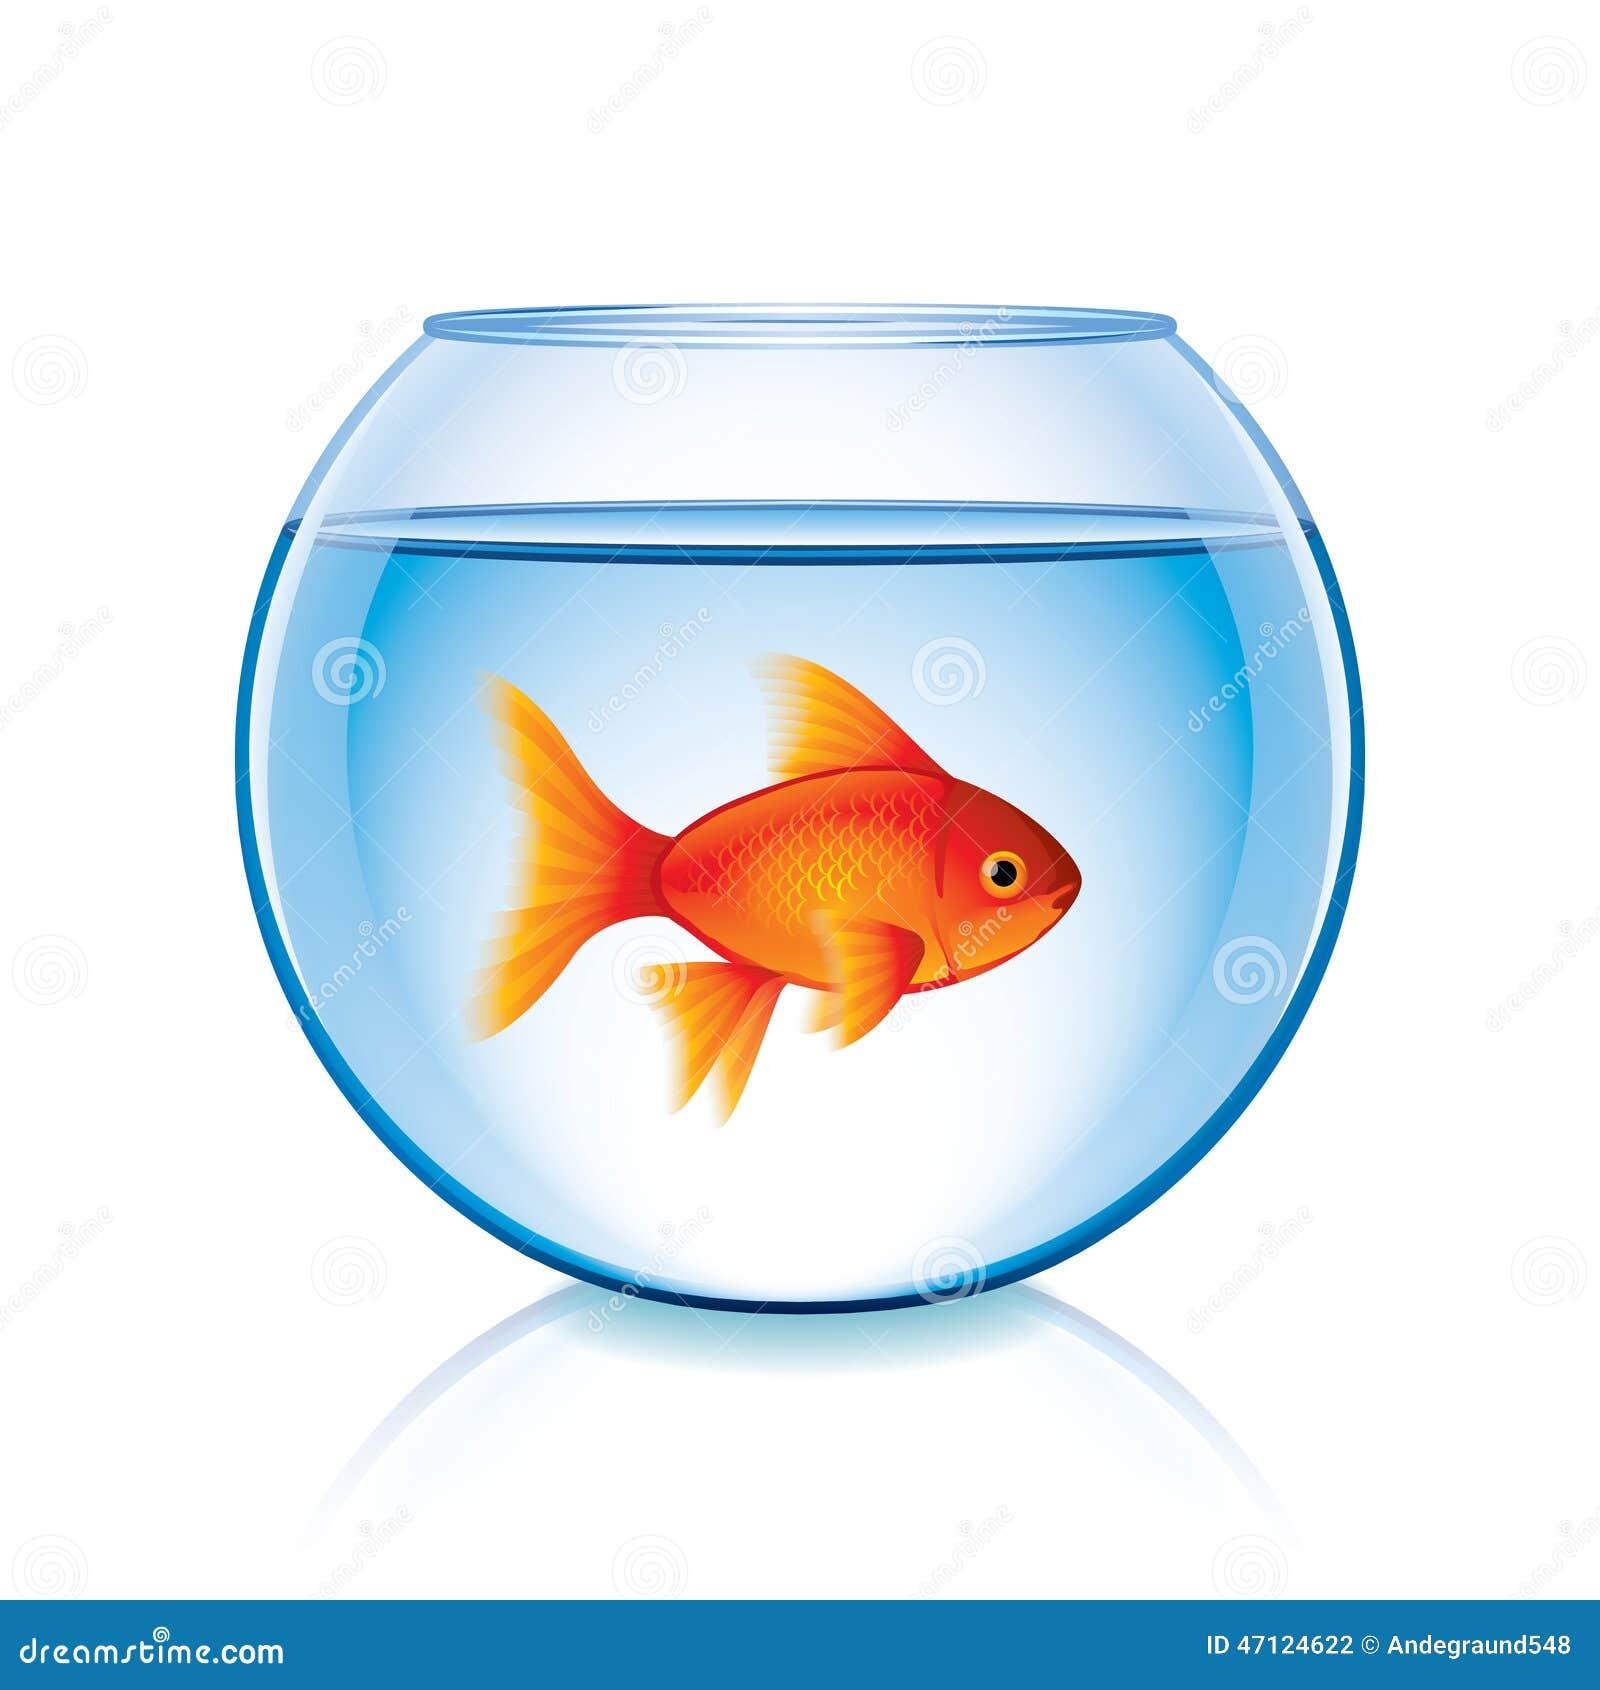 Goldfish Fish Bowl Clip Art Royalty Free Stock Photo - Image: 2741595